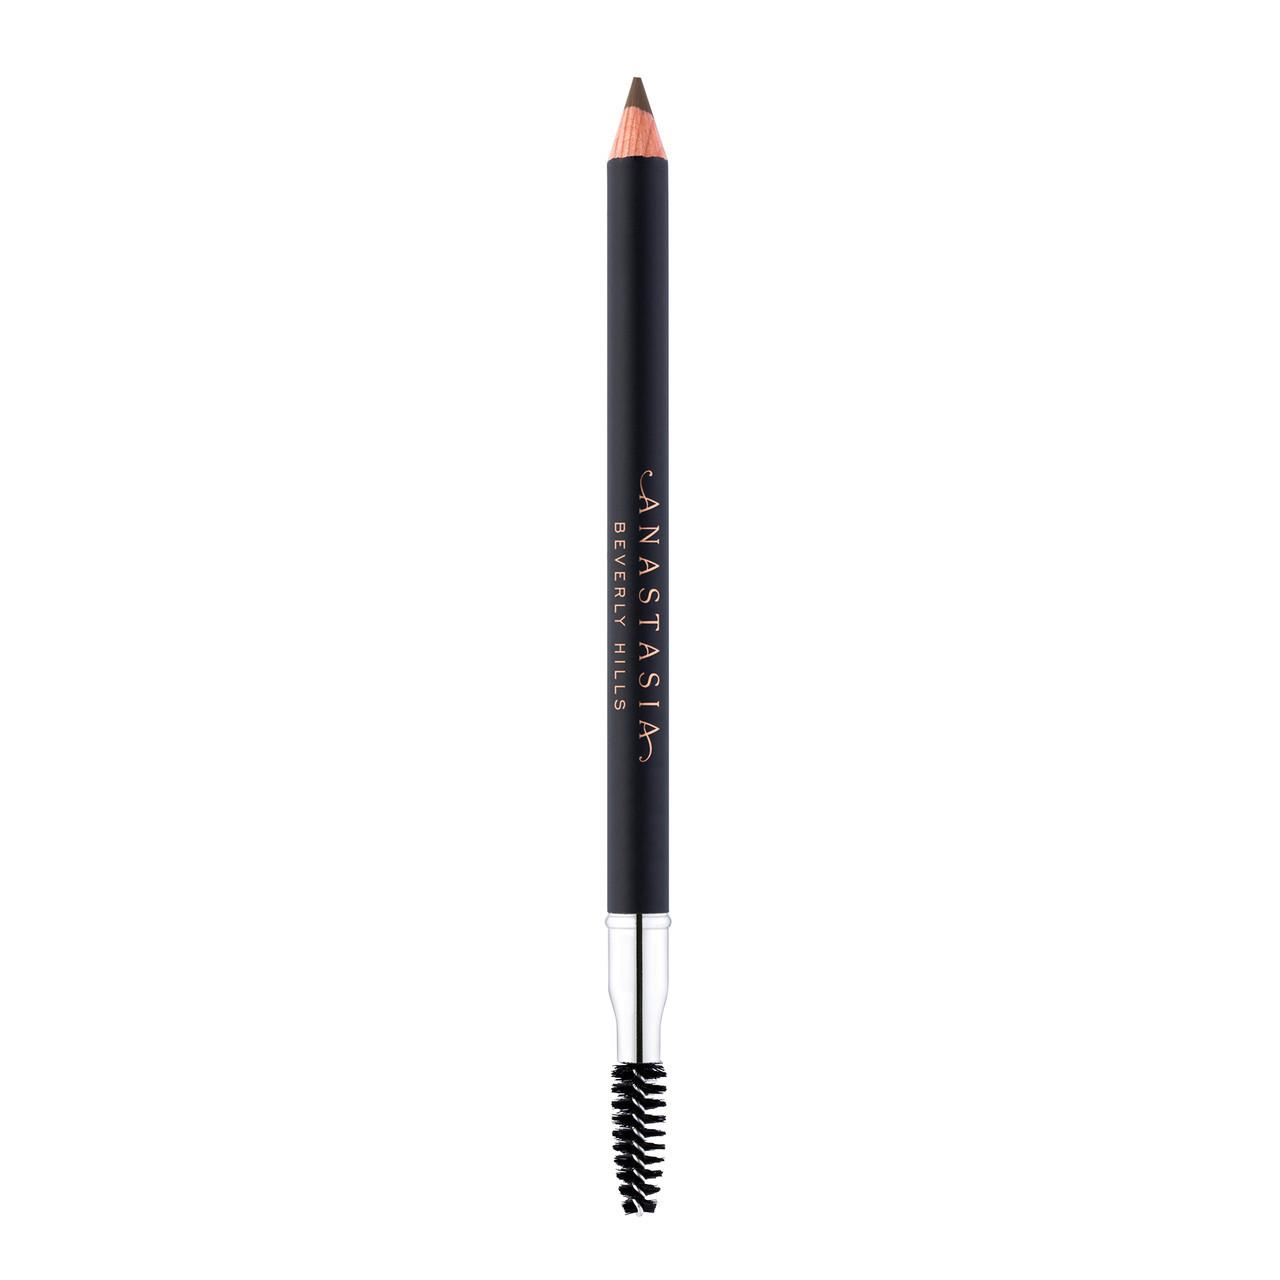 ANASTASIA BEVERLY HILLS Perfect Brow Pencil Granite